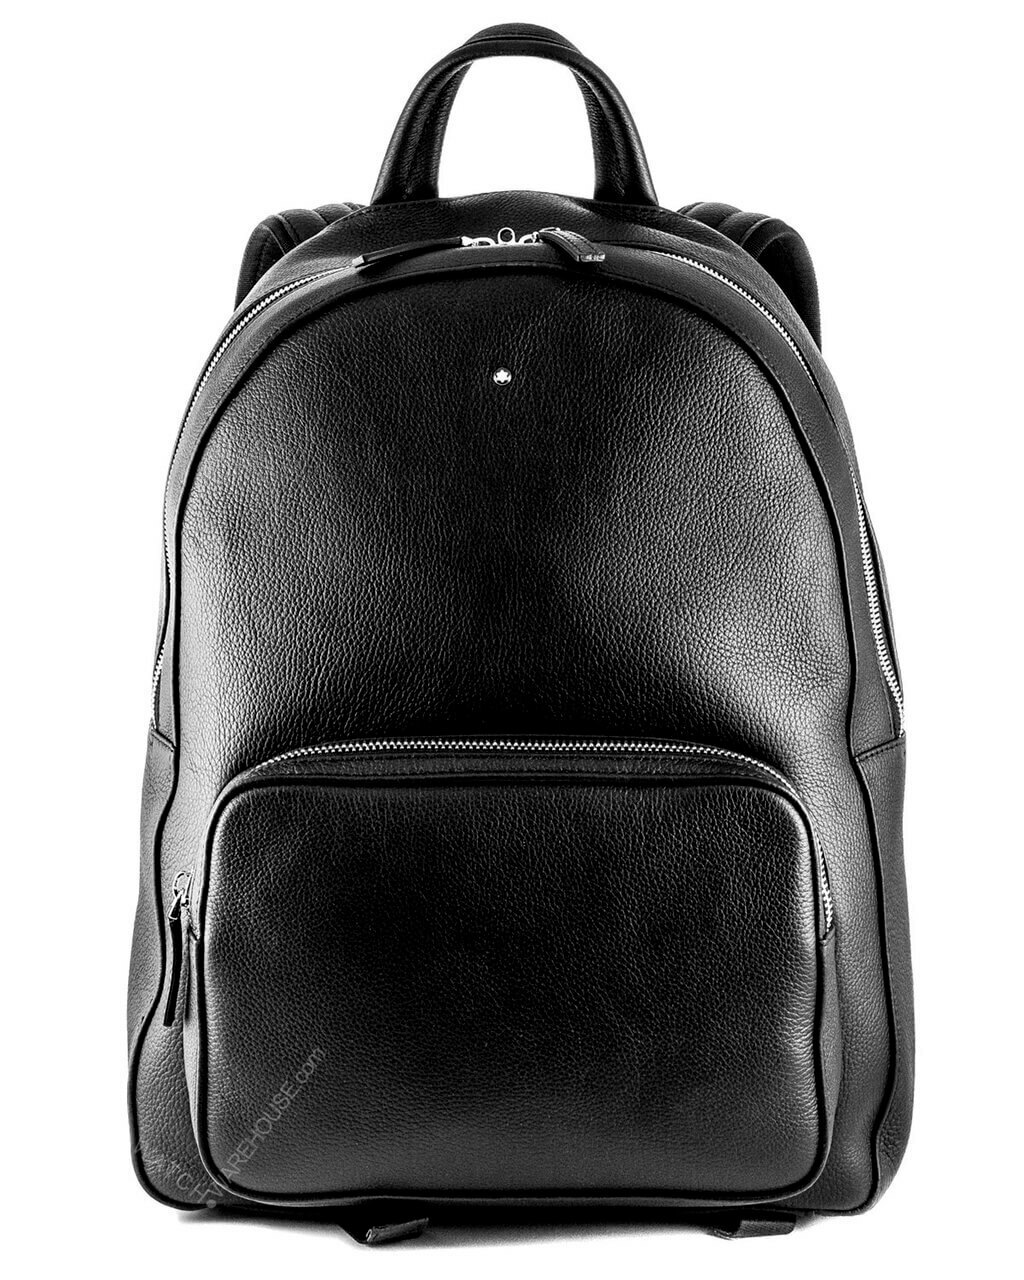 Montblanc meisterstuck large soft grain black leather backpack